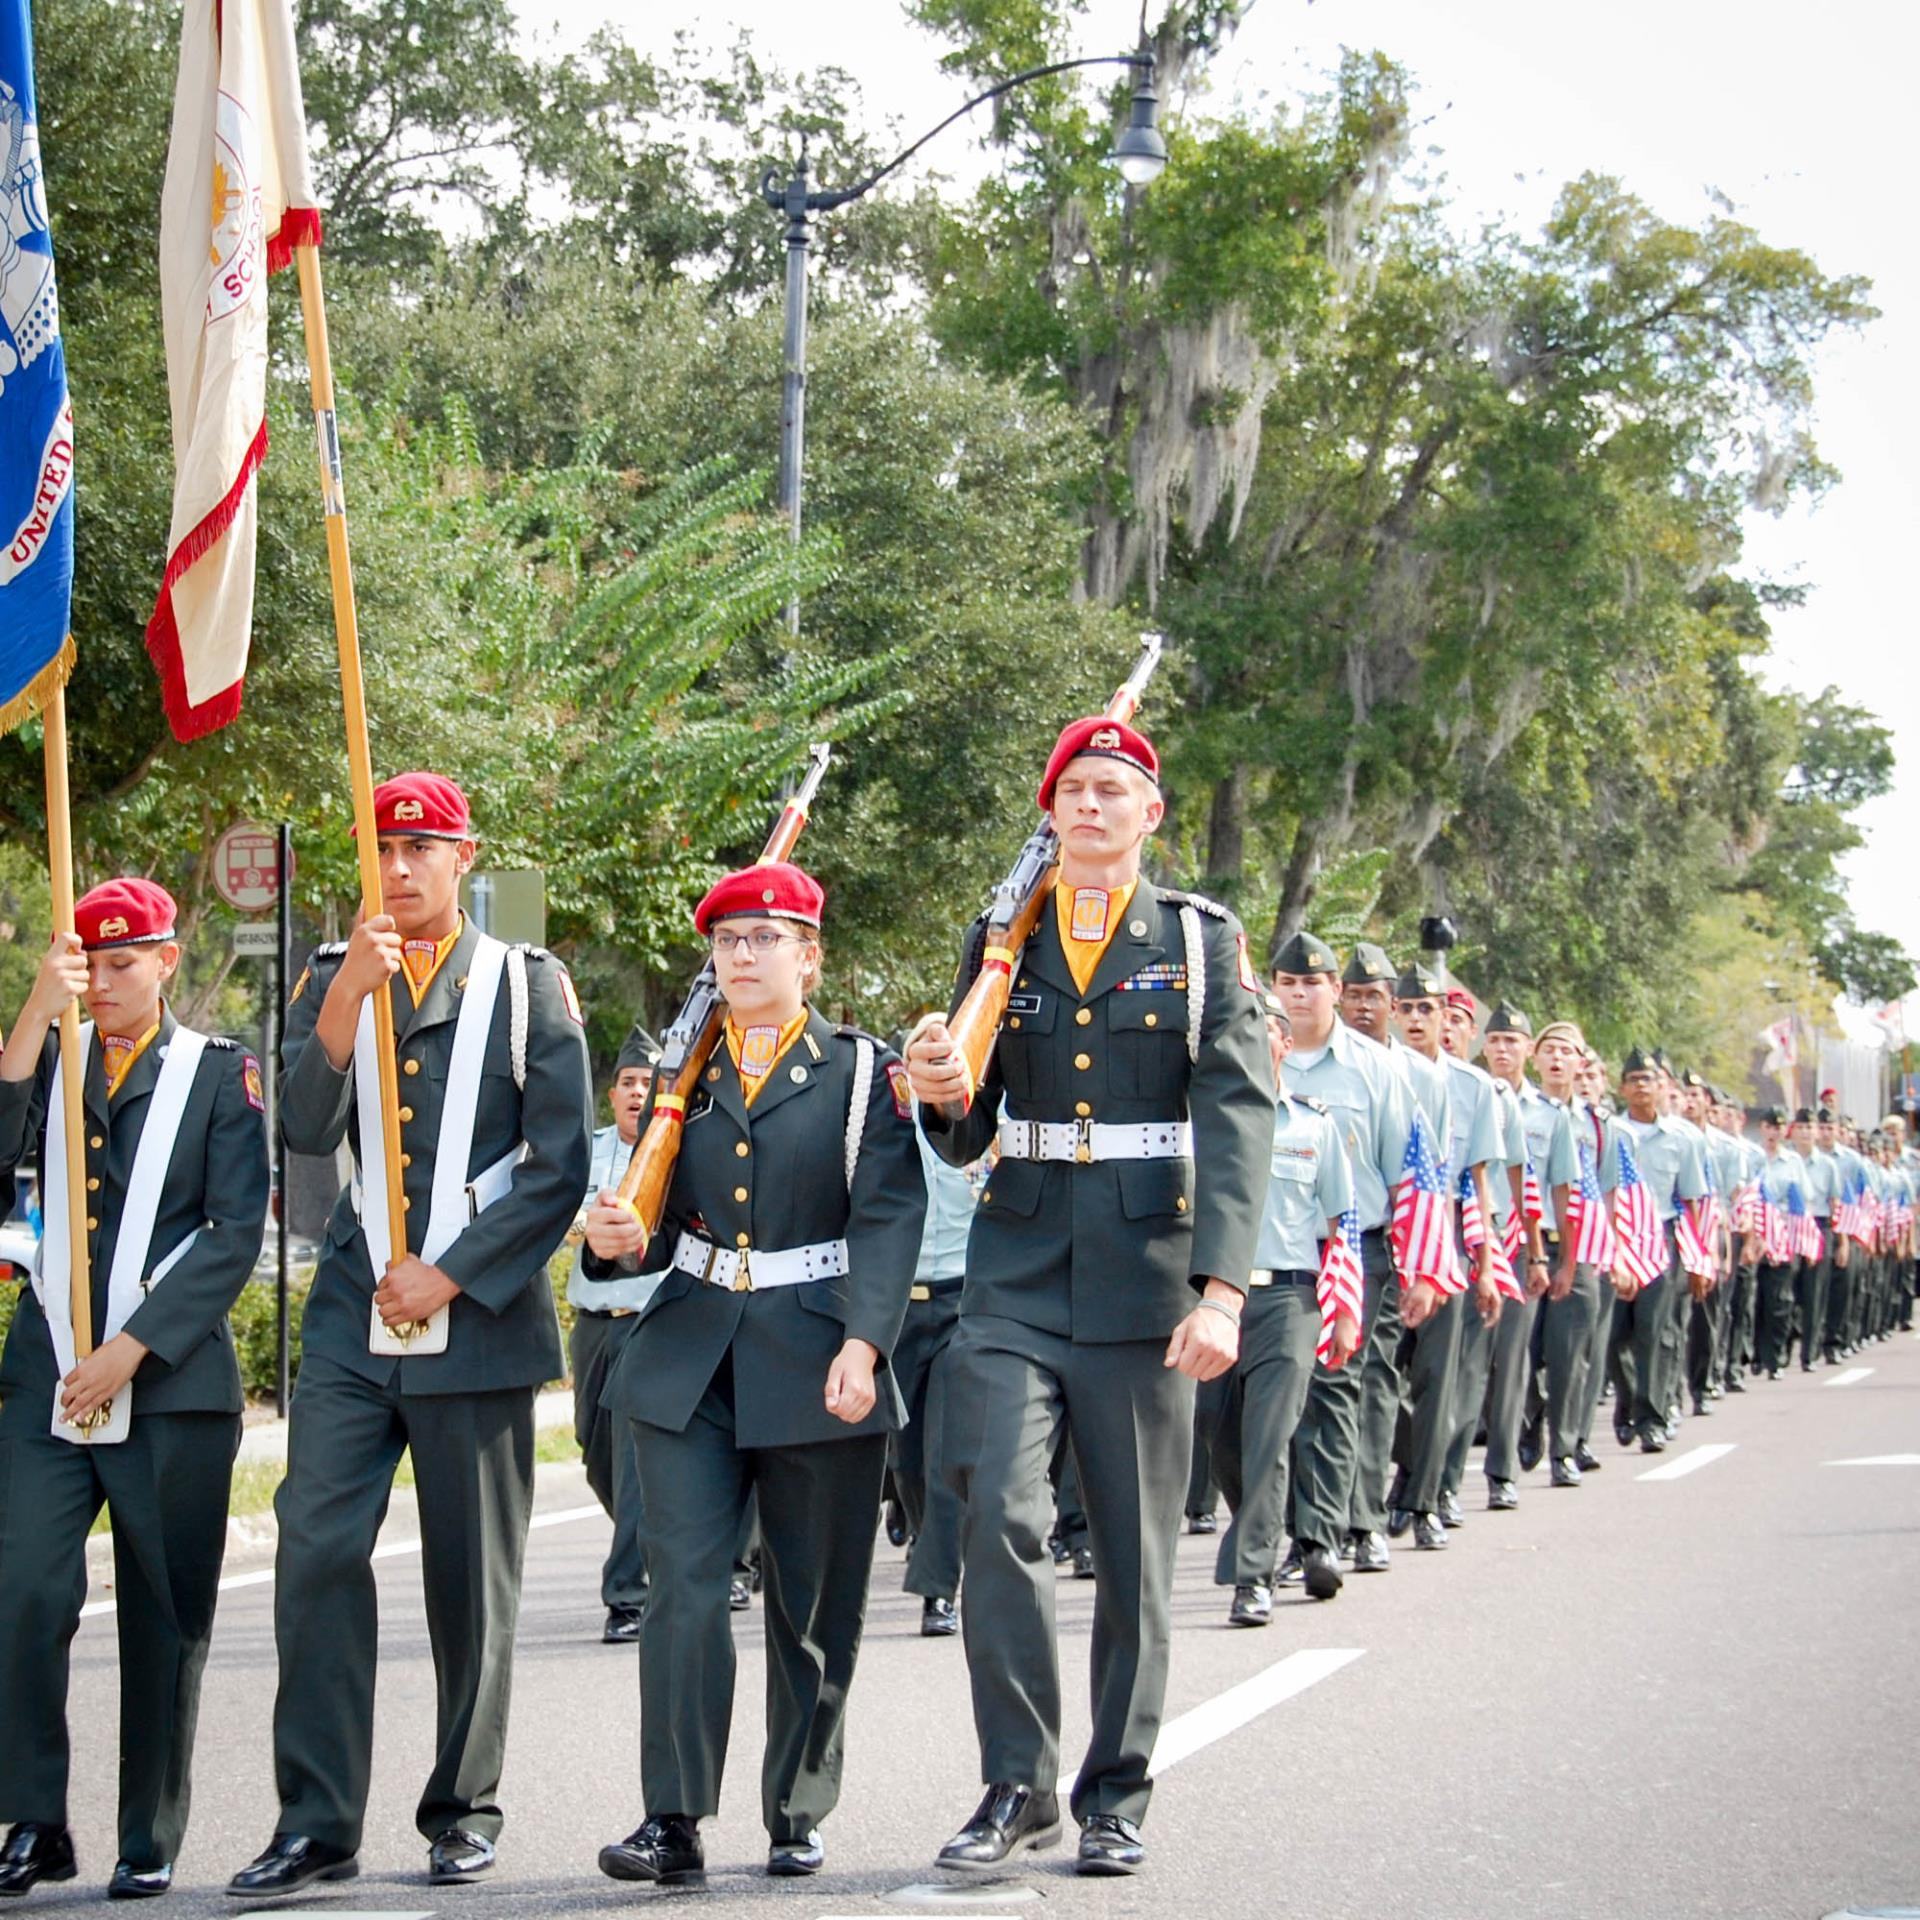 Kissimmee Christmas Parade 2019 Kissimmee Parades | City of Kissimmee, FL